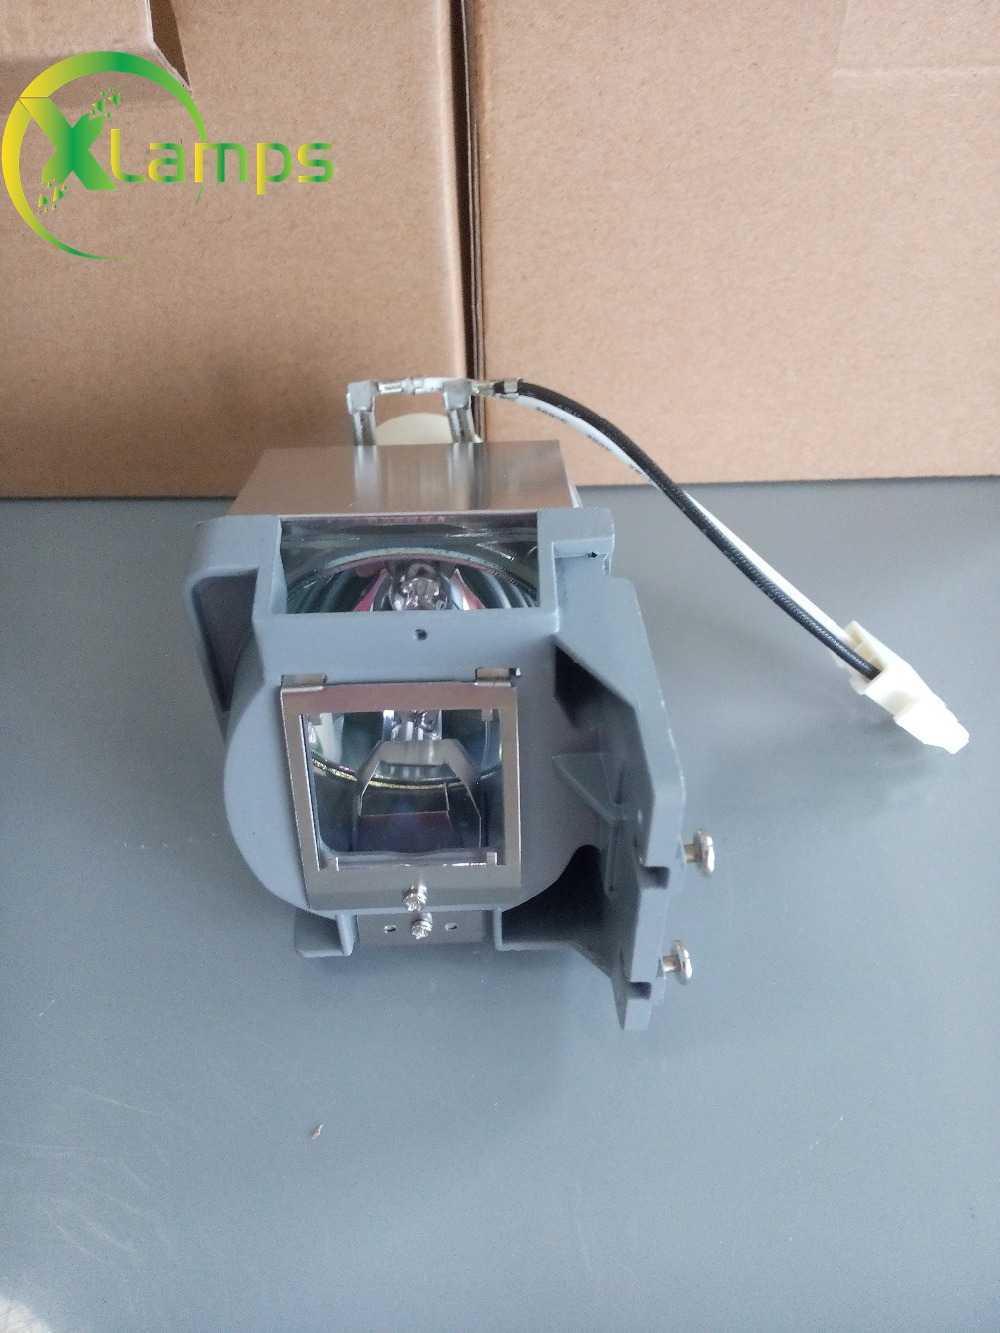 BL-FU190C Оригинальная лампа проектора с жильем для DX330 DS330 S2010 X2010 S2015 X2015 W2015 W303 S303 X303 BR320 BR325 X302 DX5